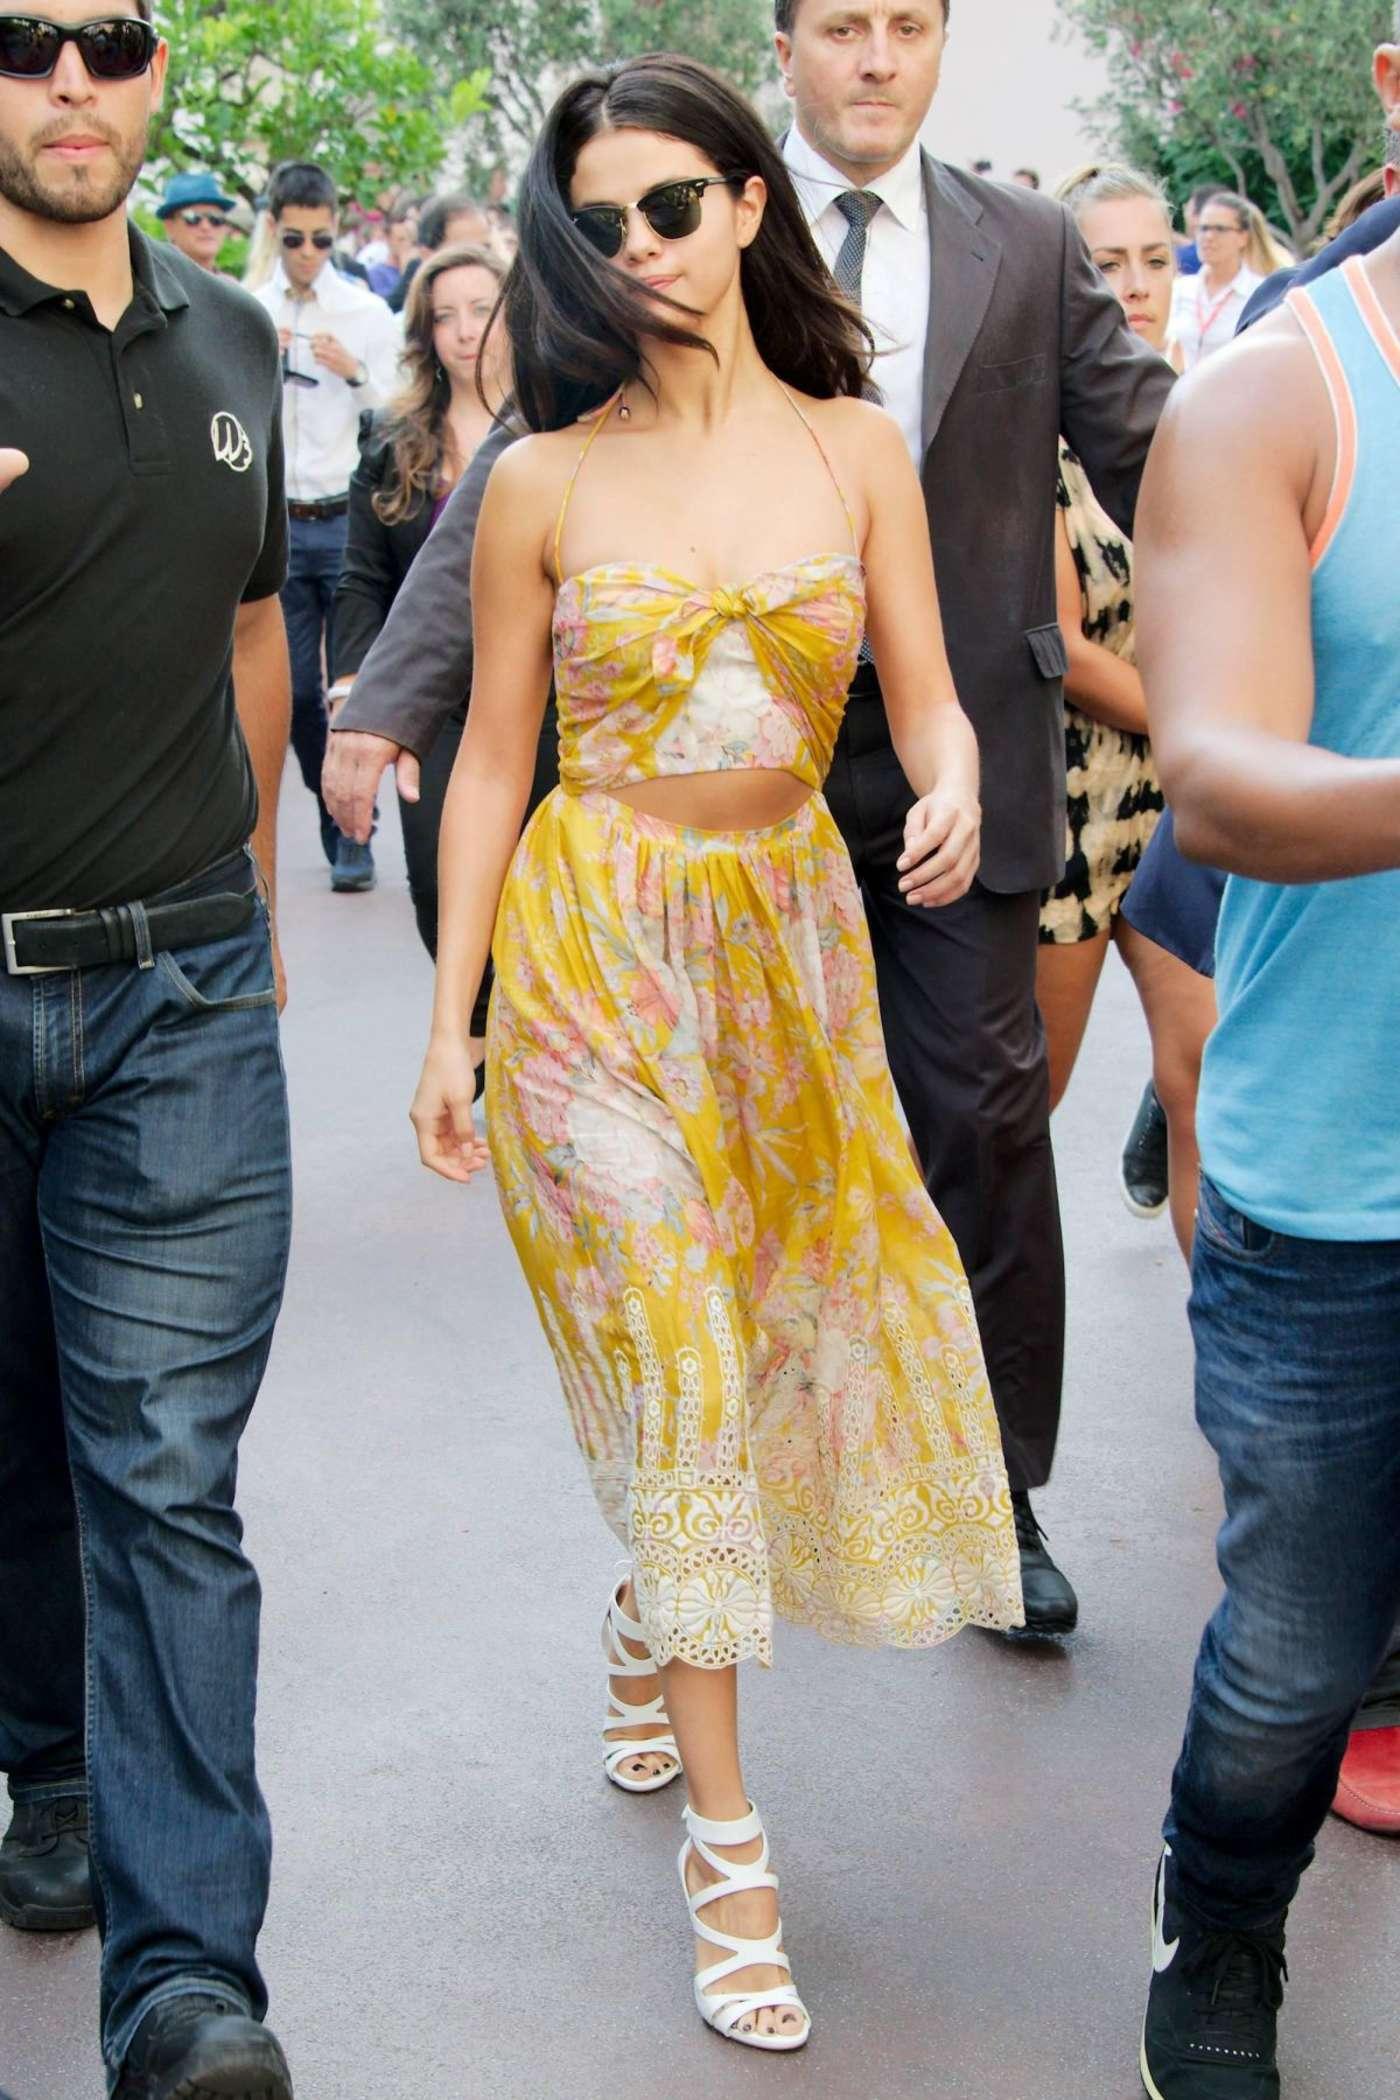 selena gomez hot in yellow dress 05 gotceleb